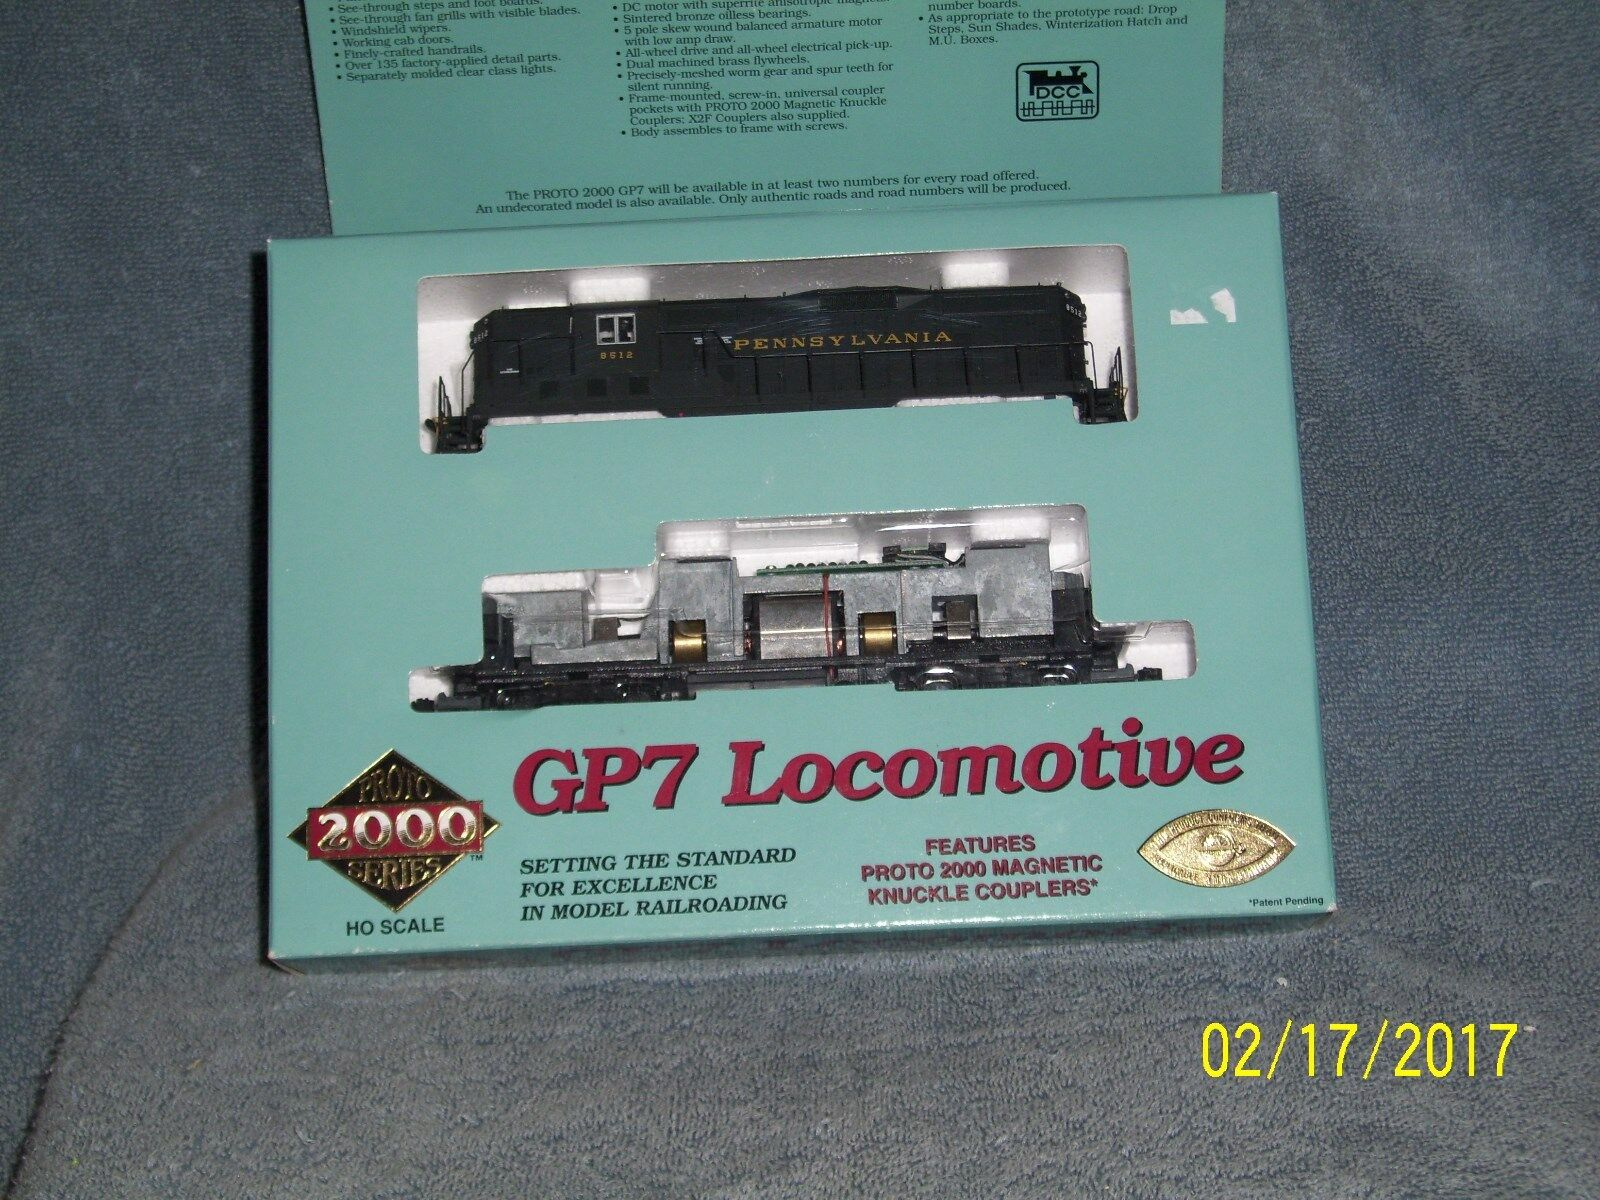 moda ProssoO 2000 2000 2000 HO SCALE  23044 GP7 Ph l l PRR  8512 w DYNAMIC BRAKES & DROP STEPS  in vendita online